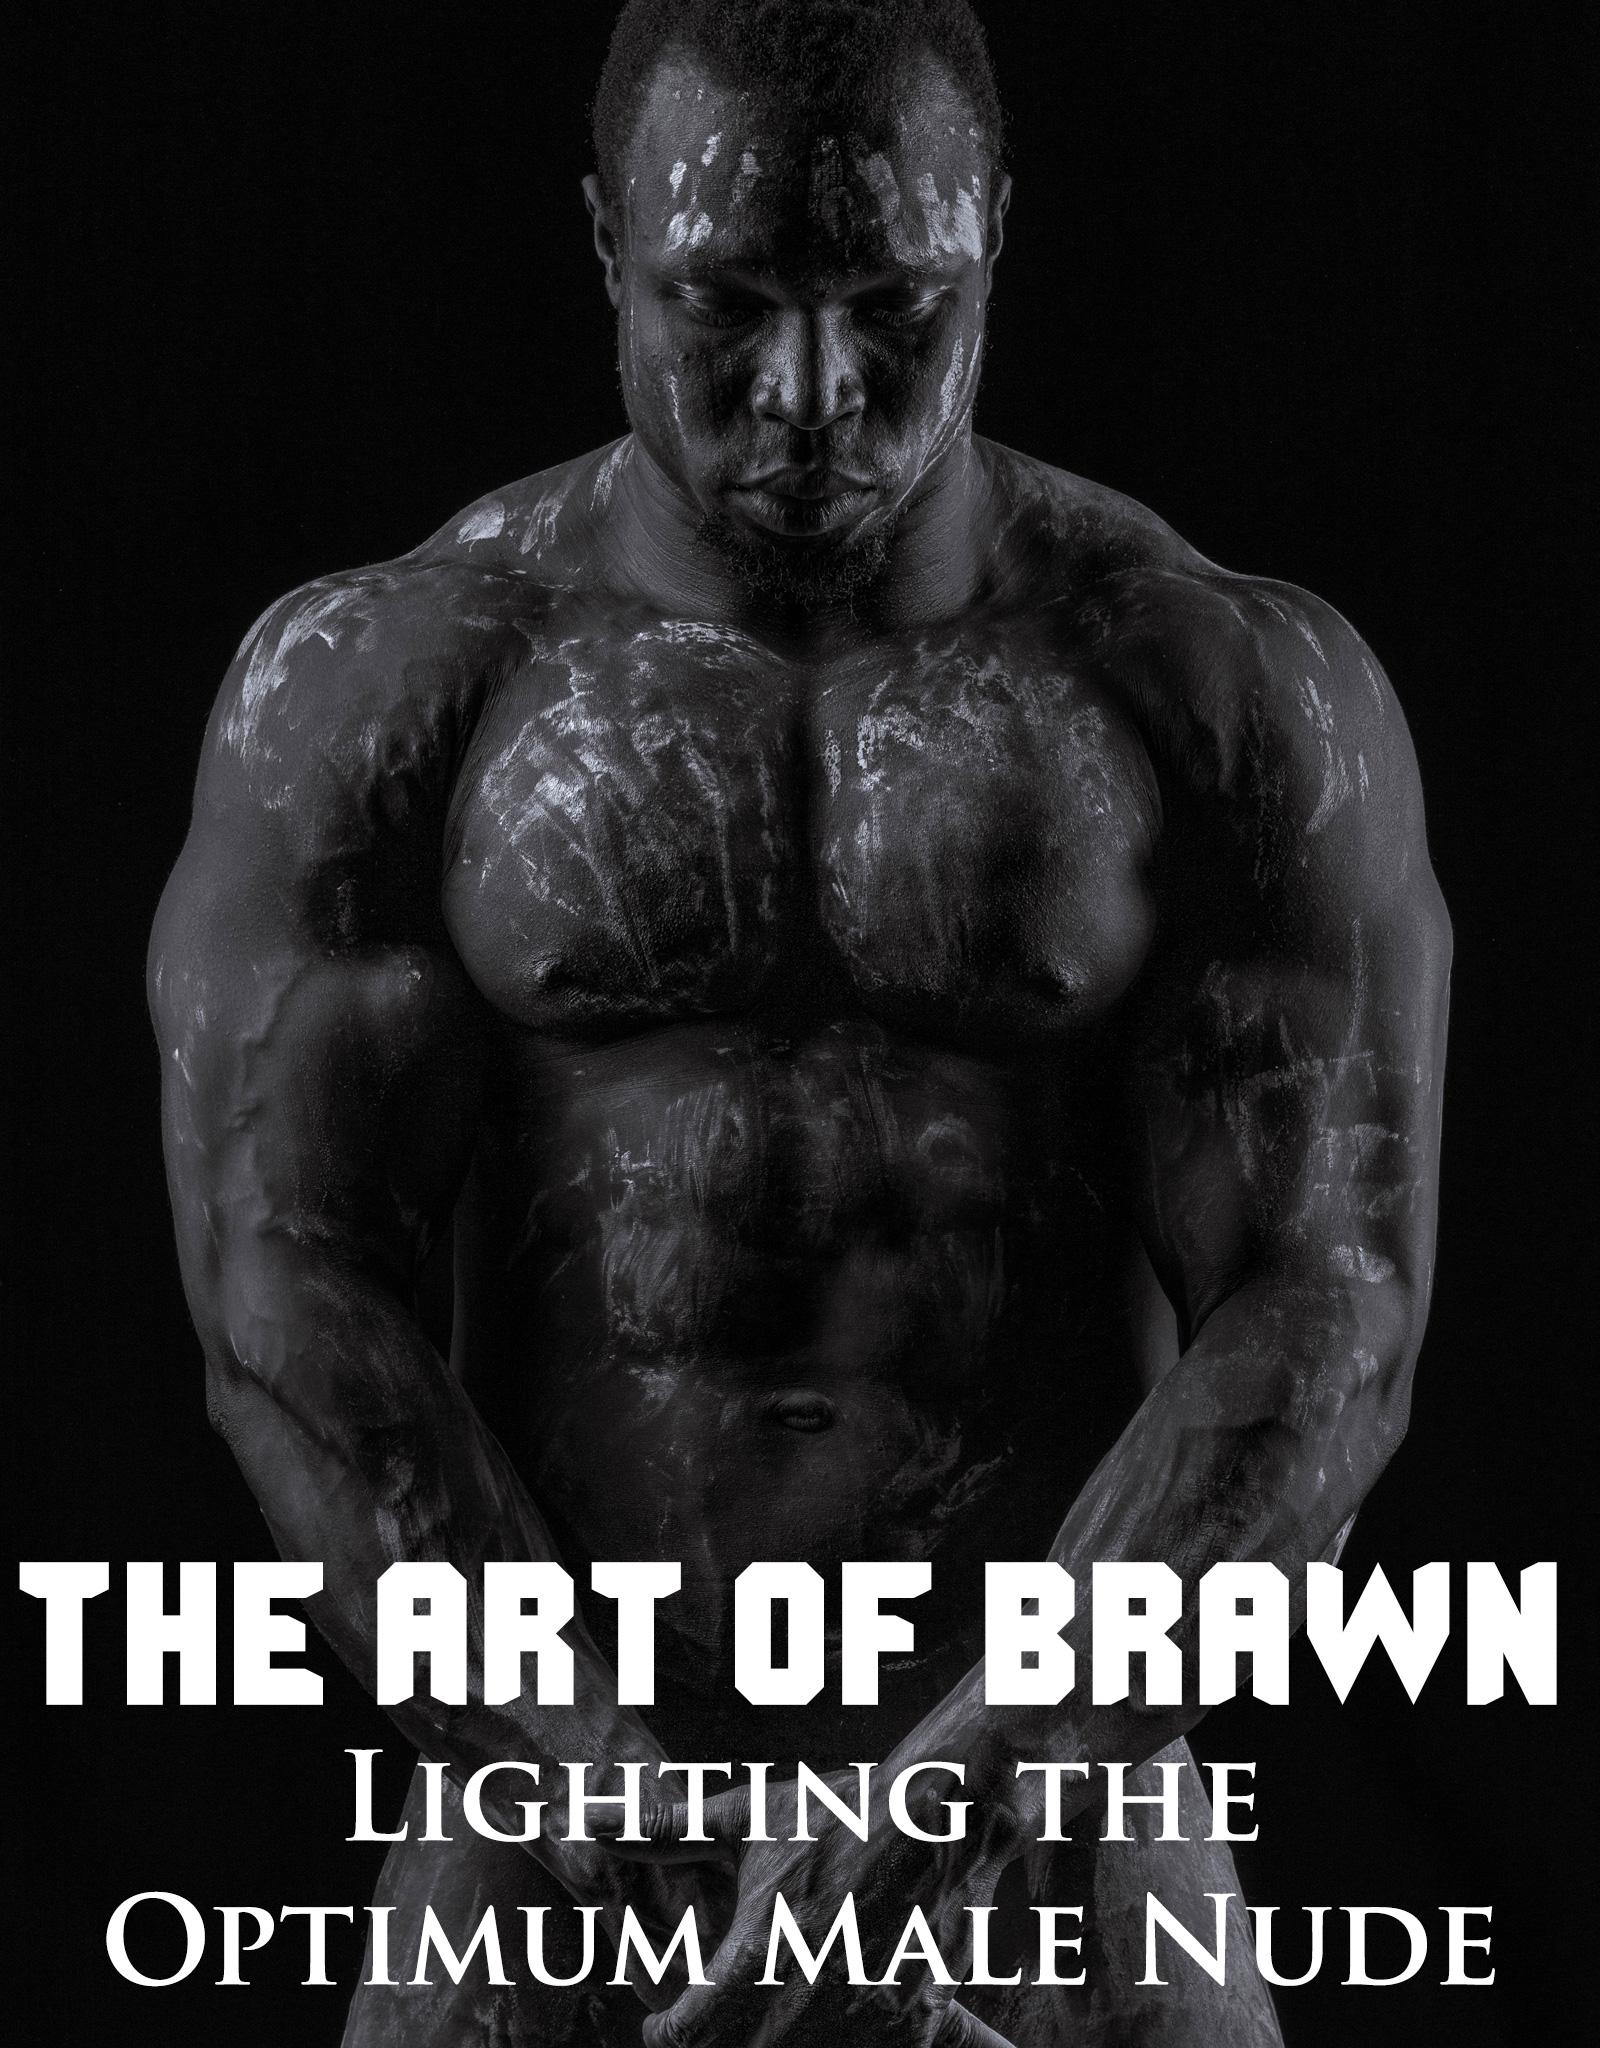 The Art of Brawn: Lighting the Optimum Male Nude